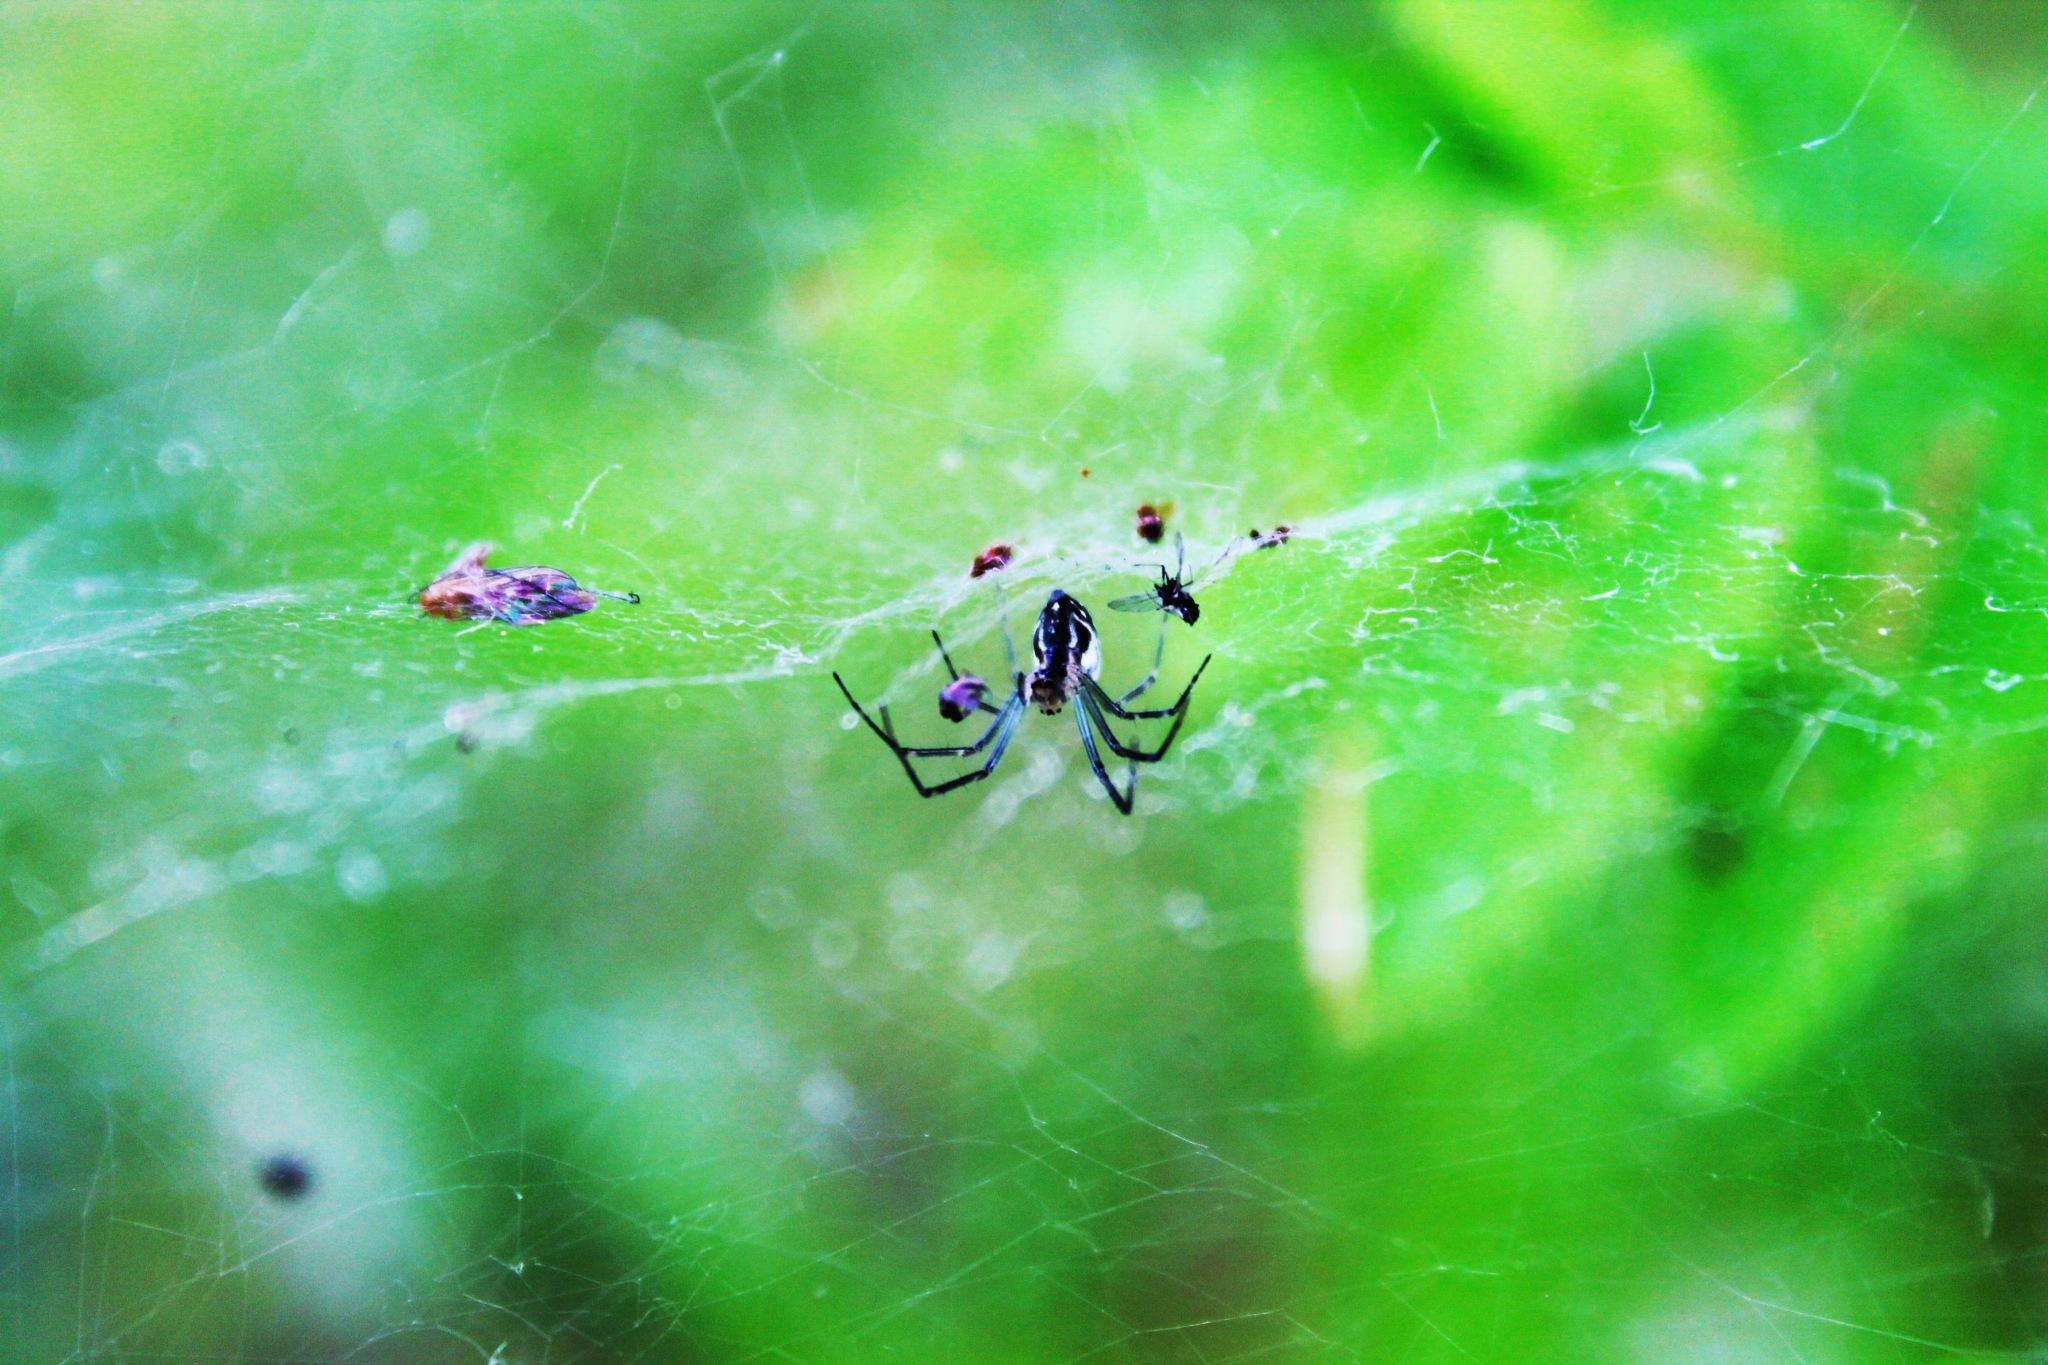 Lunch time for the spider. by Jonatan Gabalski